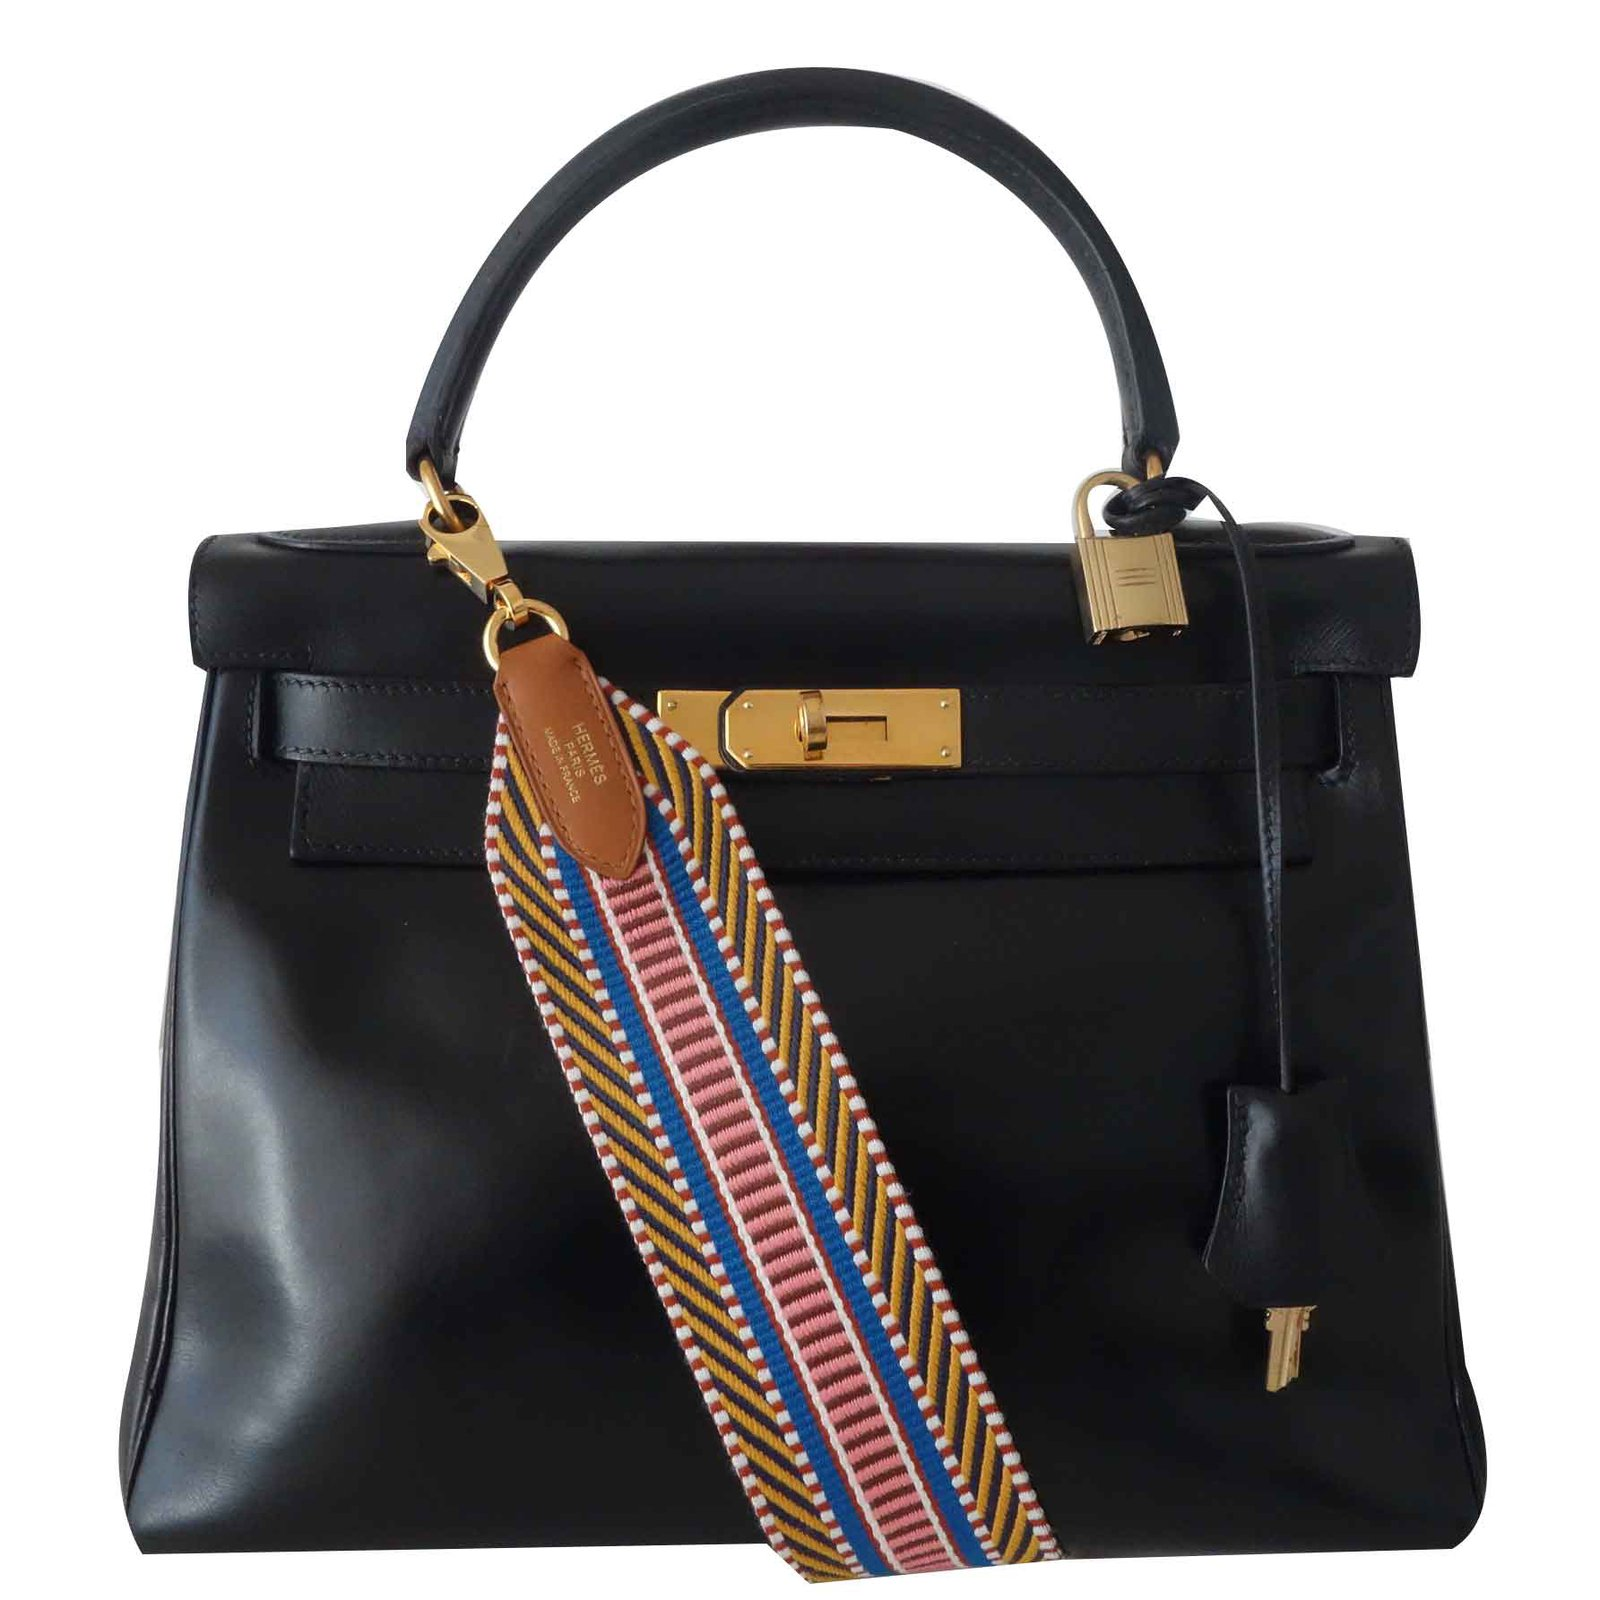 07b83c4e2845 Hermès Vintage Hermes Kelly bag 28 Handbags Leather Black ref.108345 ...